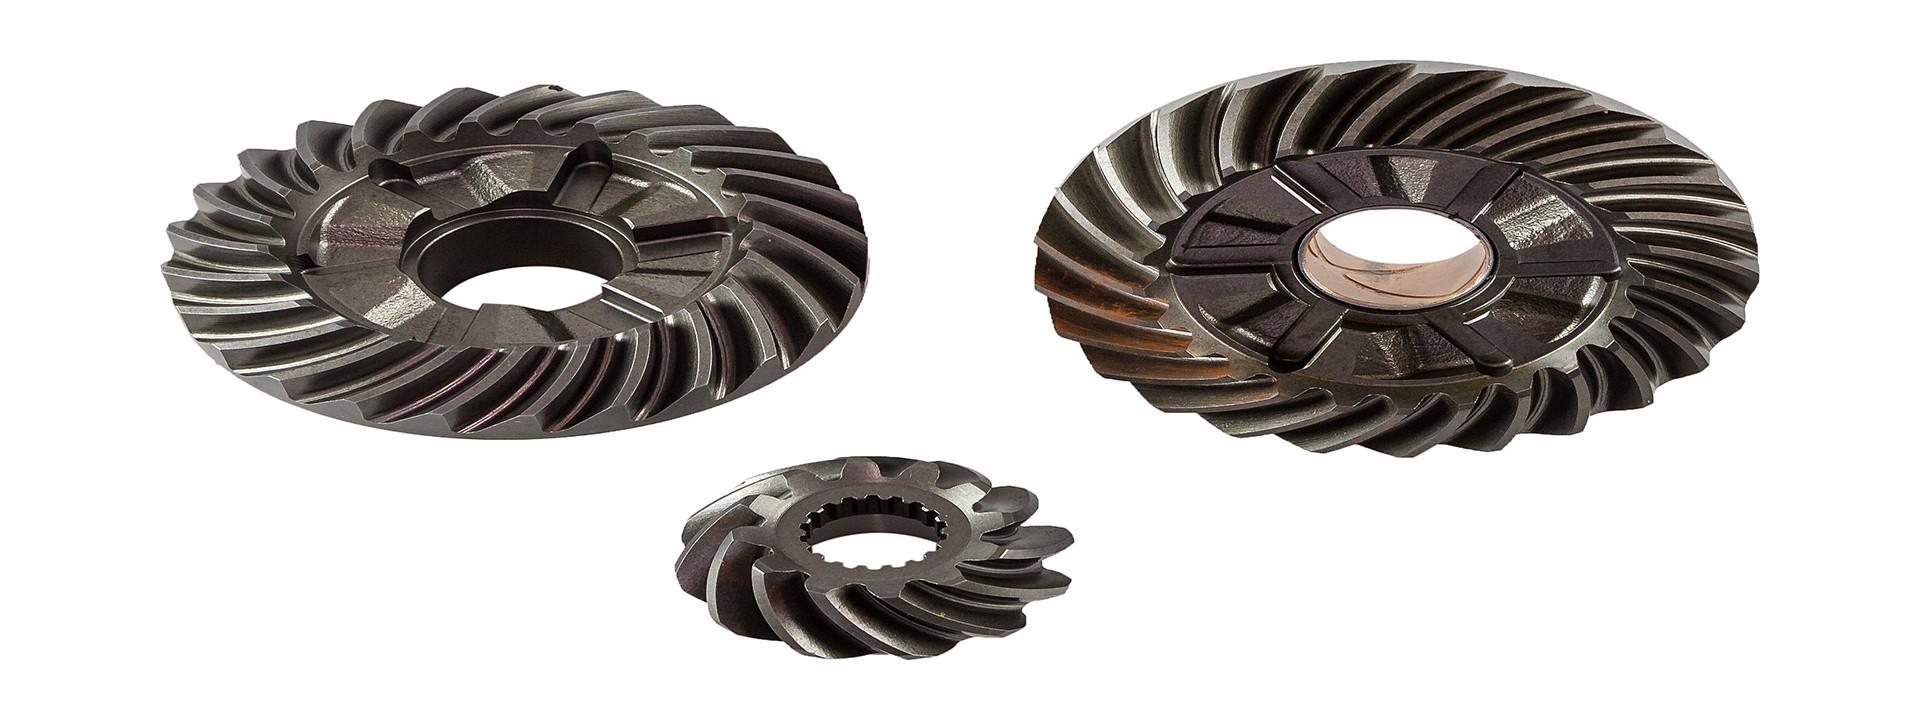 41614 shesterni reduktora suzuki dt115 140 komplekt 5730094832000 - Комплект шестерней